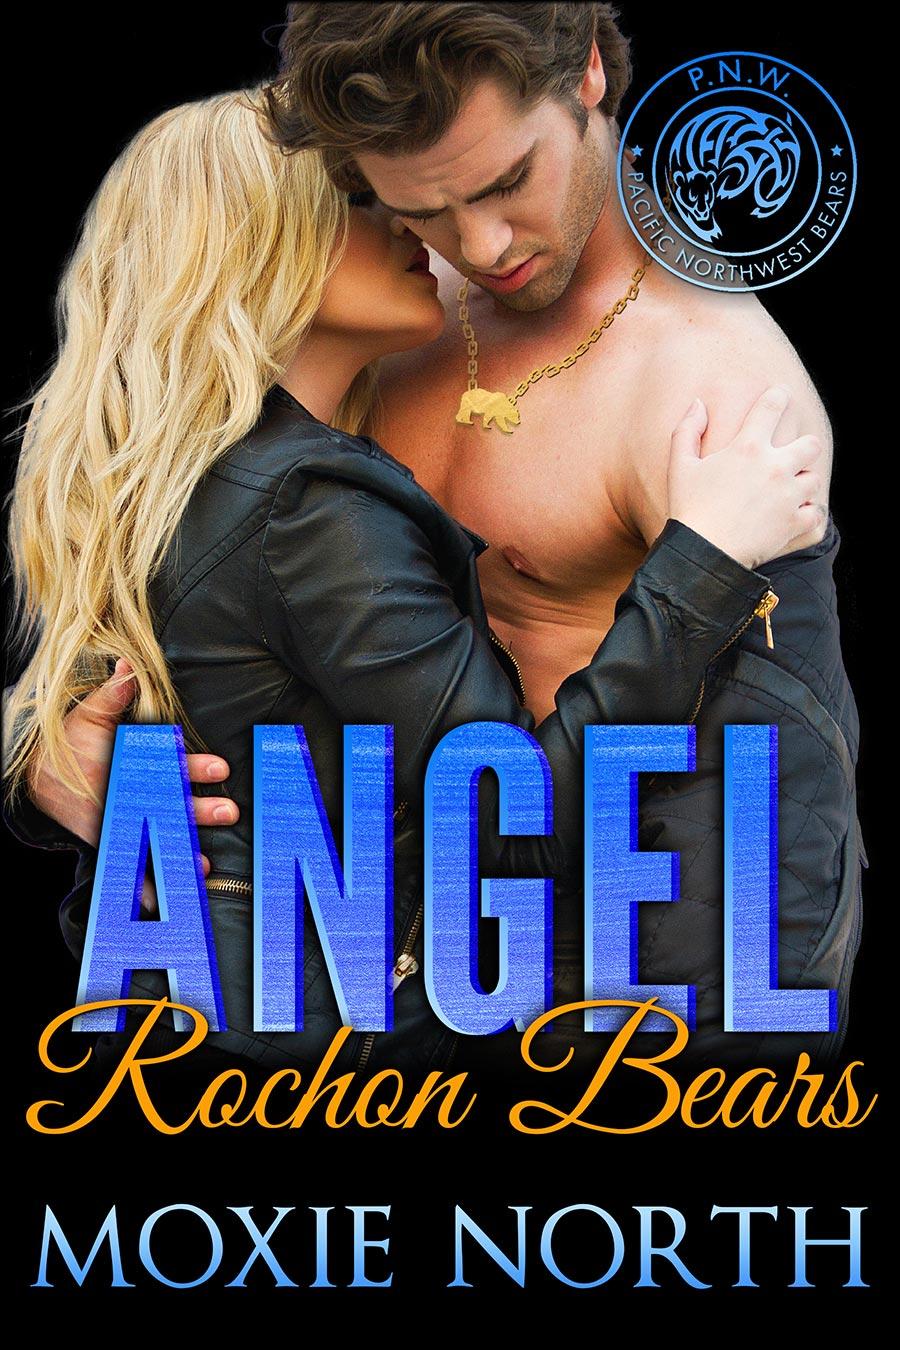 Angel---Rochon-Brothers---Moxie-North.jpg